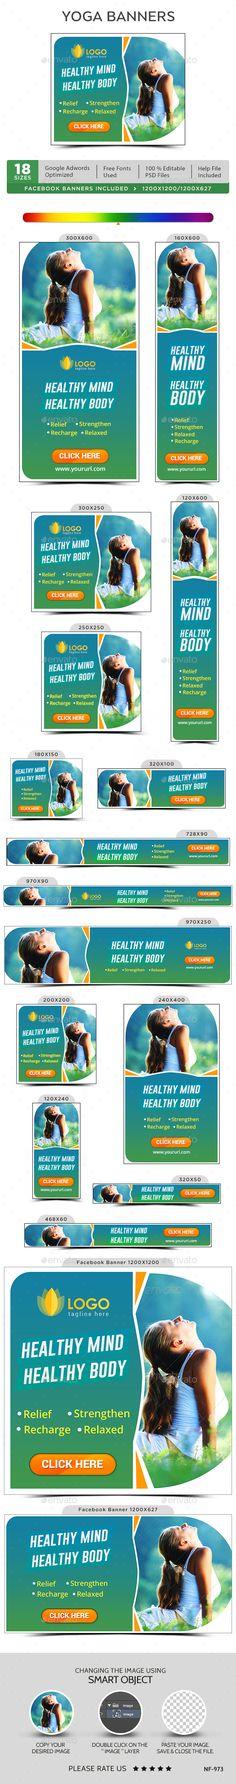 Yoga & Meditation Web Banners Template PSD. Download here: http://graphicriver.net/item/yoga-meditation-banners/15023055?ref=ksioks